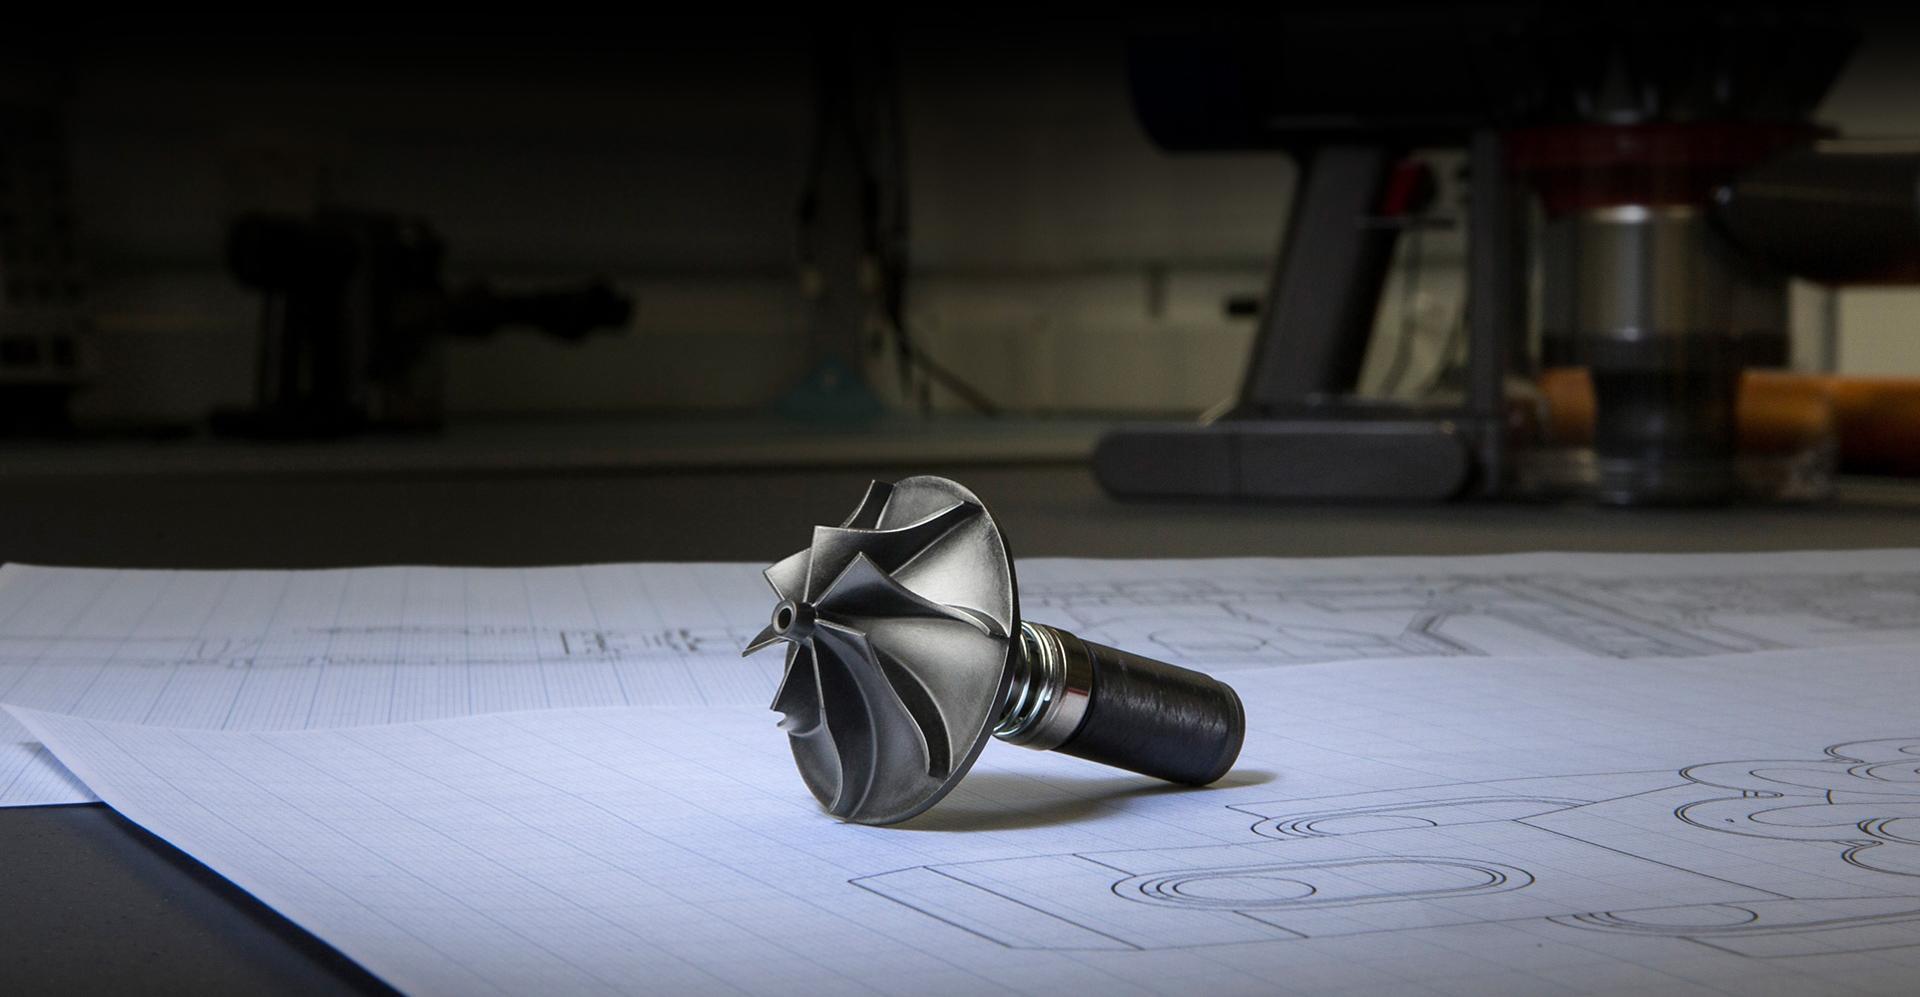 Dyson engineer sketch